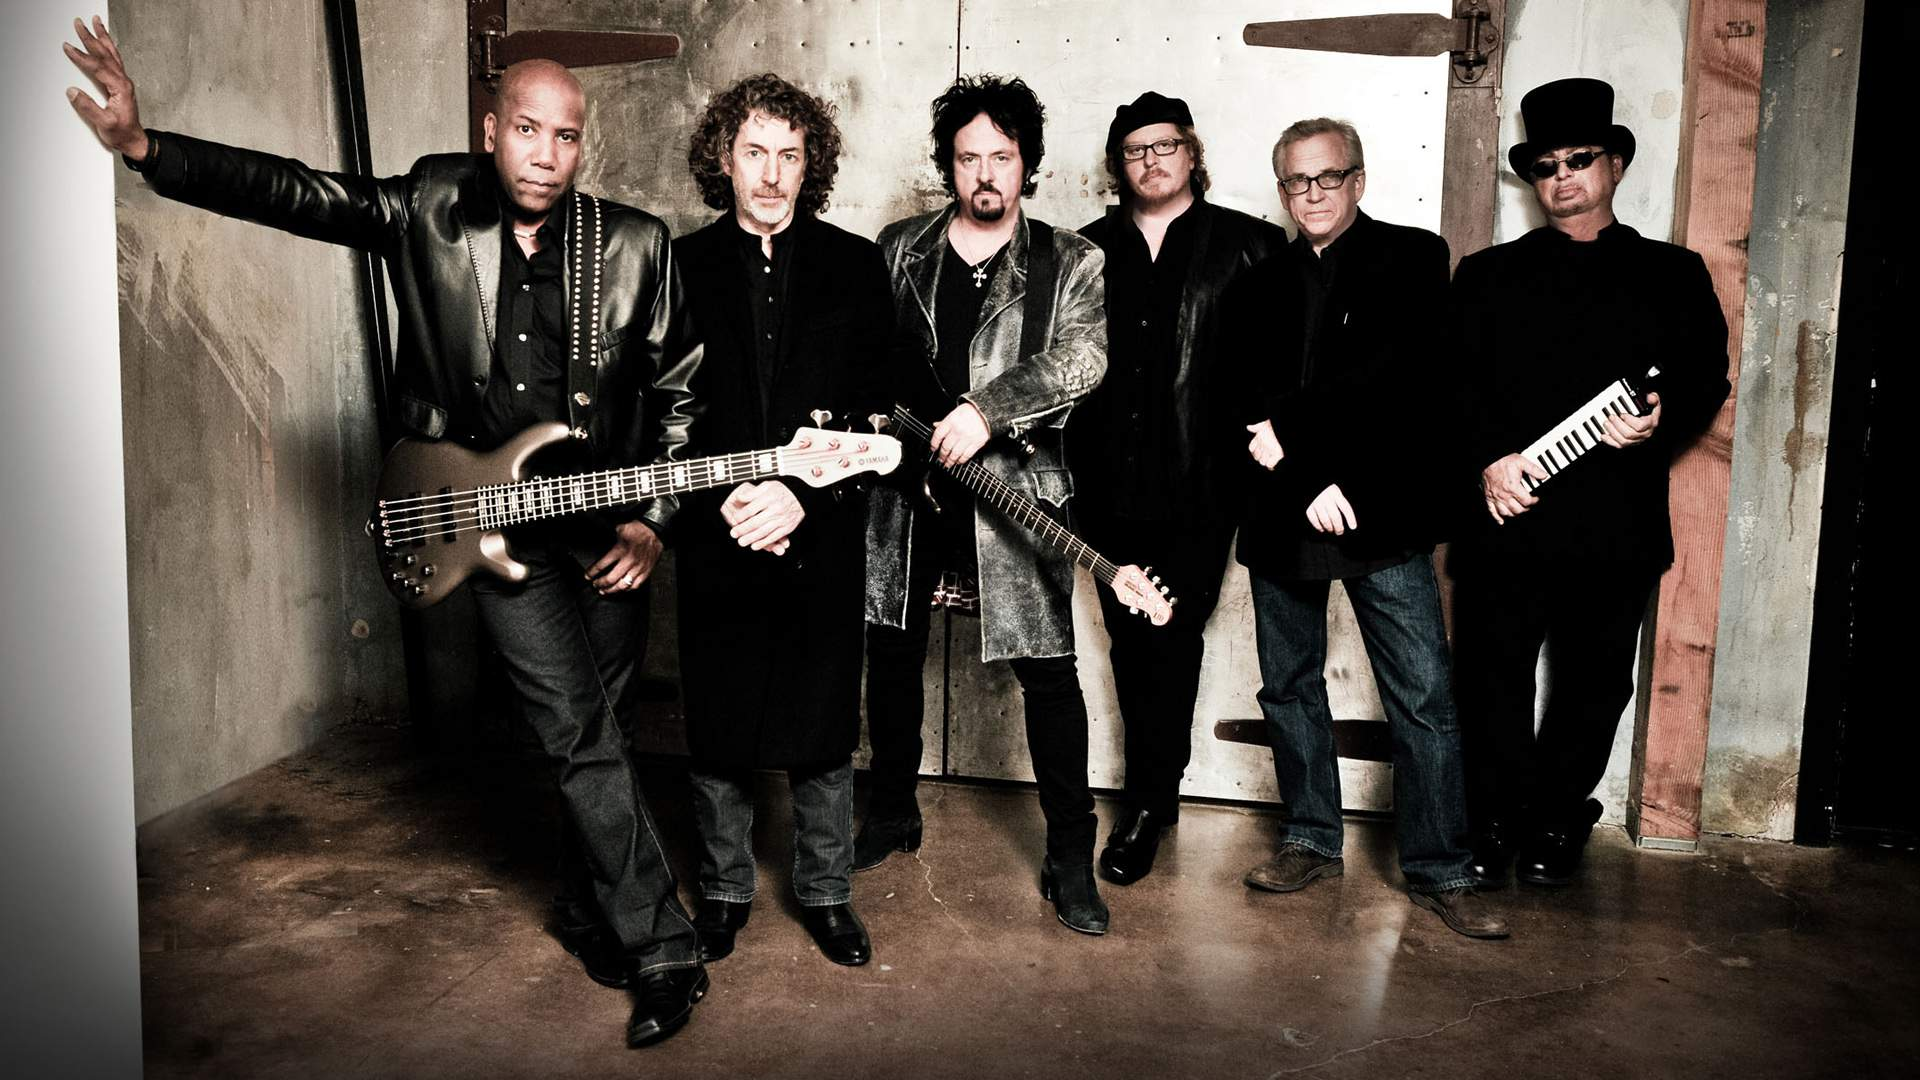 Picnic Music: концерт группы Toto